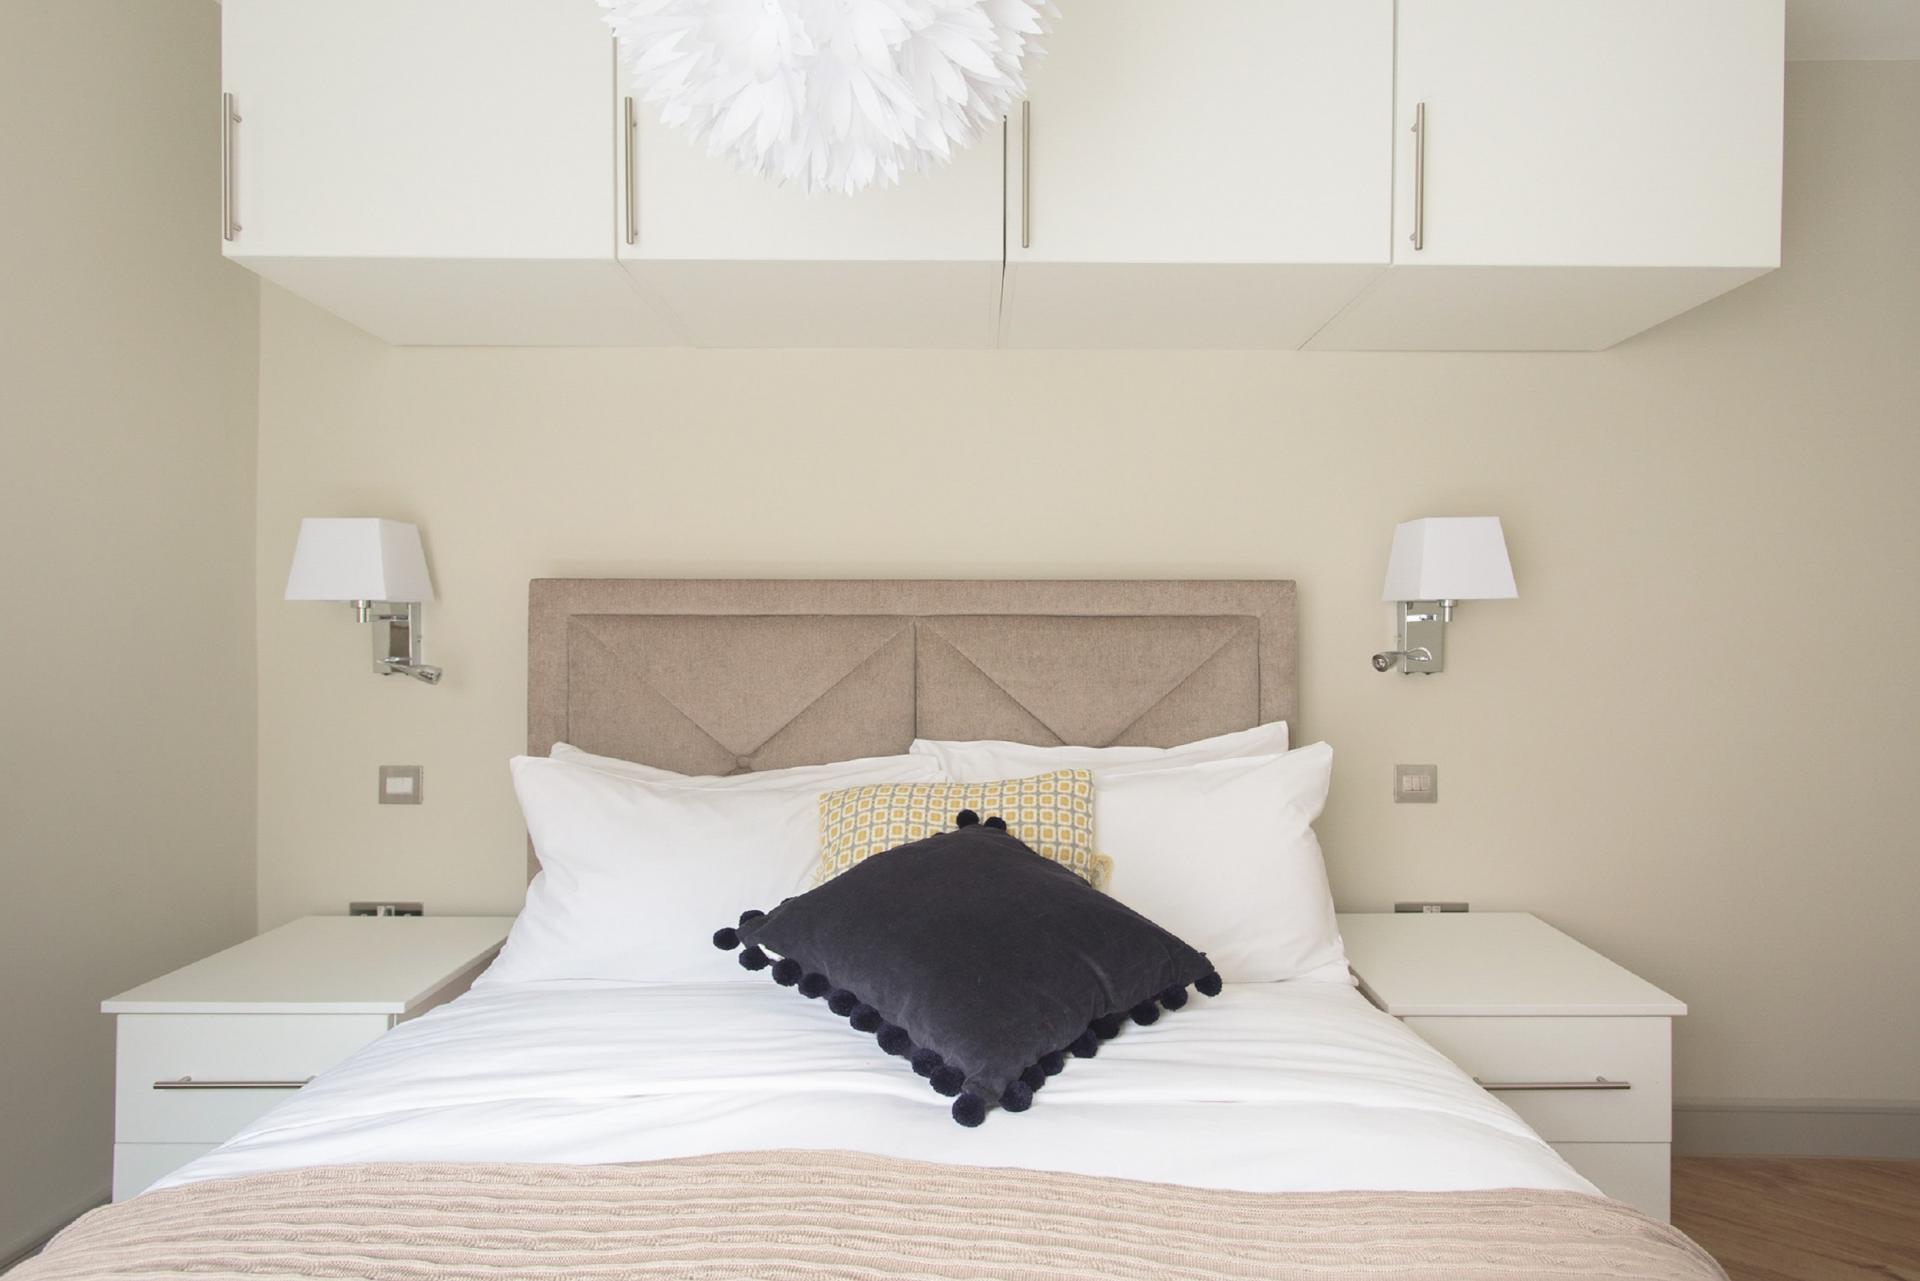 Bed at The New Bond Street Loft, Mayfair, London